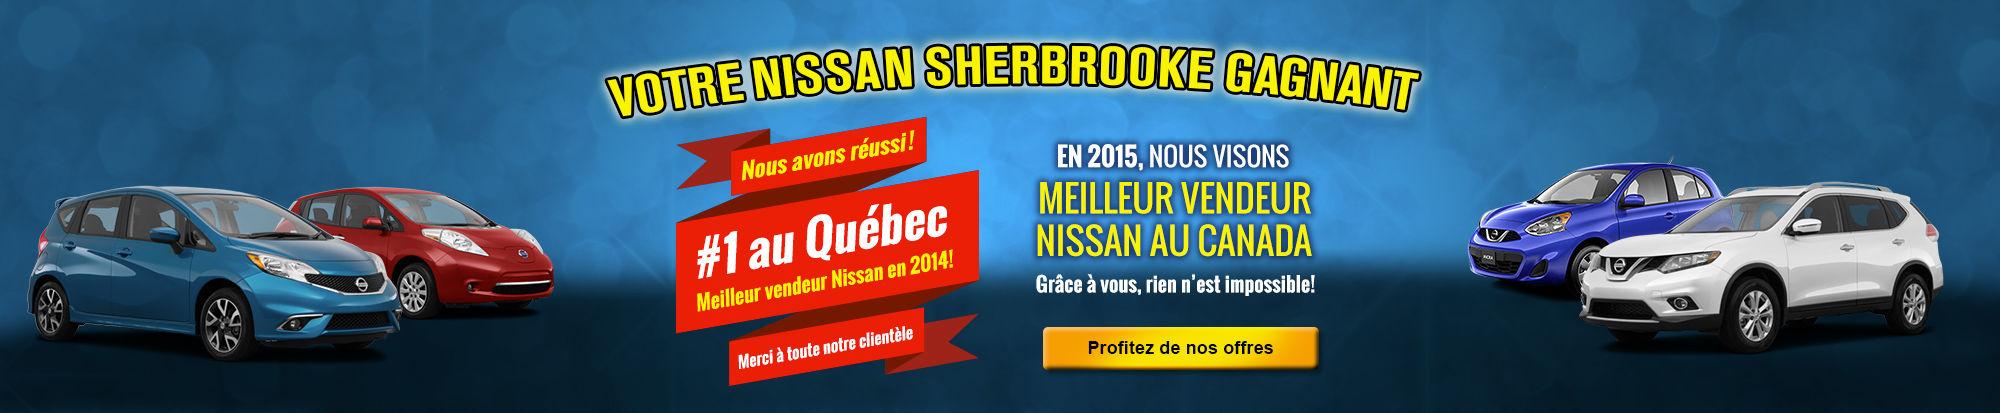 NissanSherbrookePremierAuQuebec